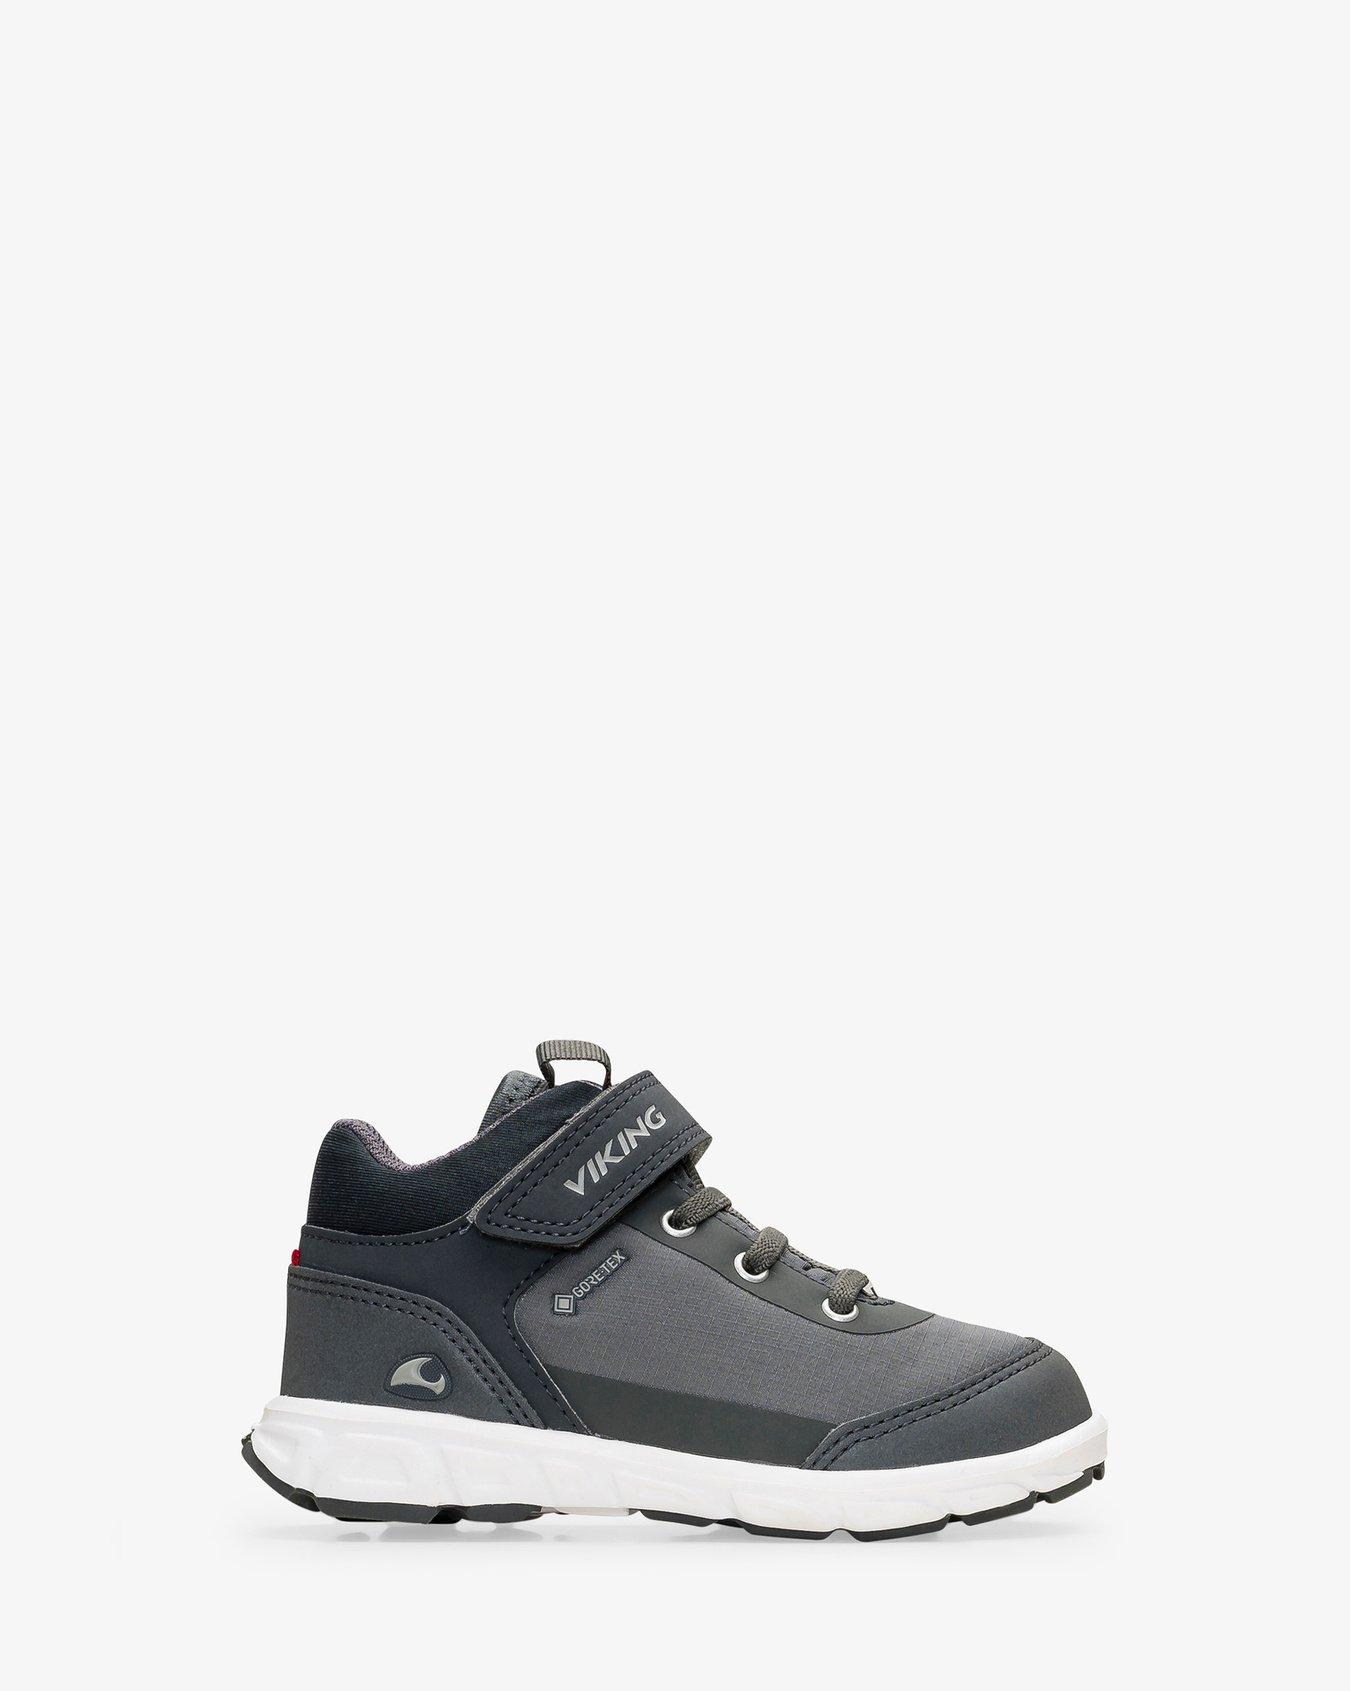 Spectrum R Mid GTX Sneaker